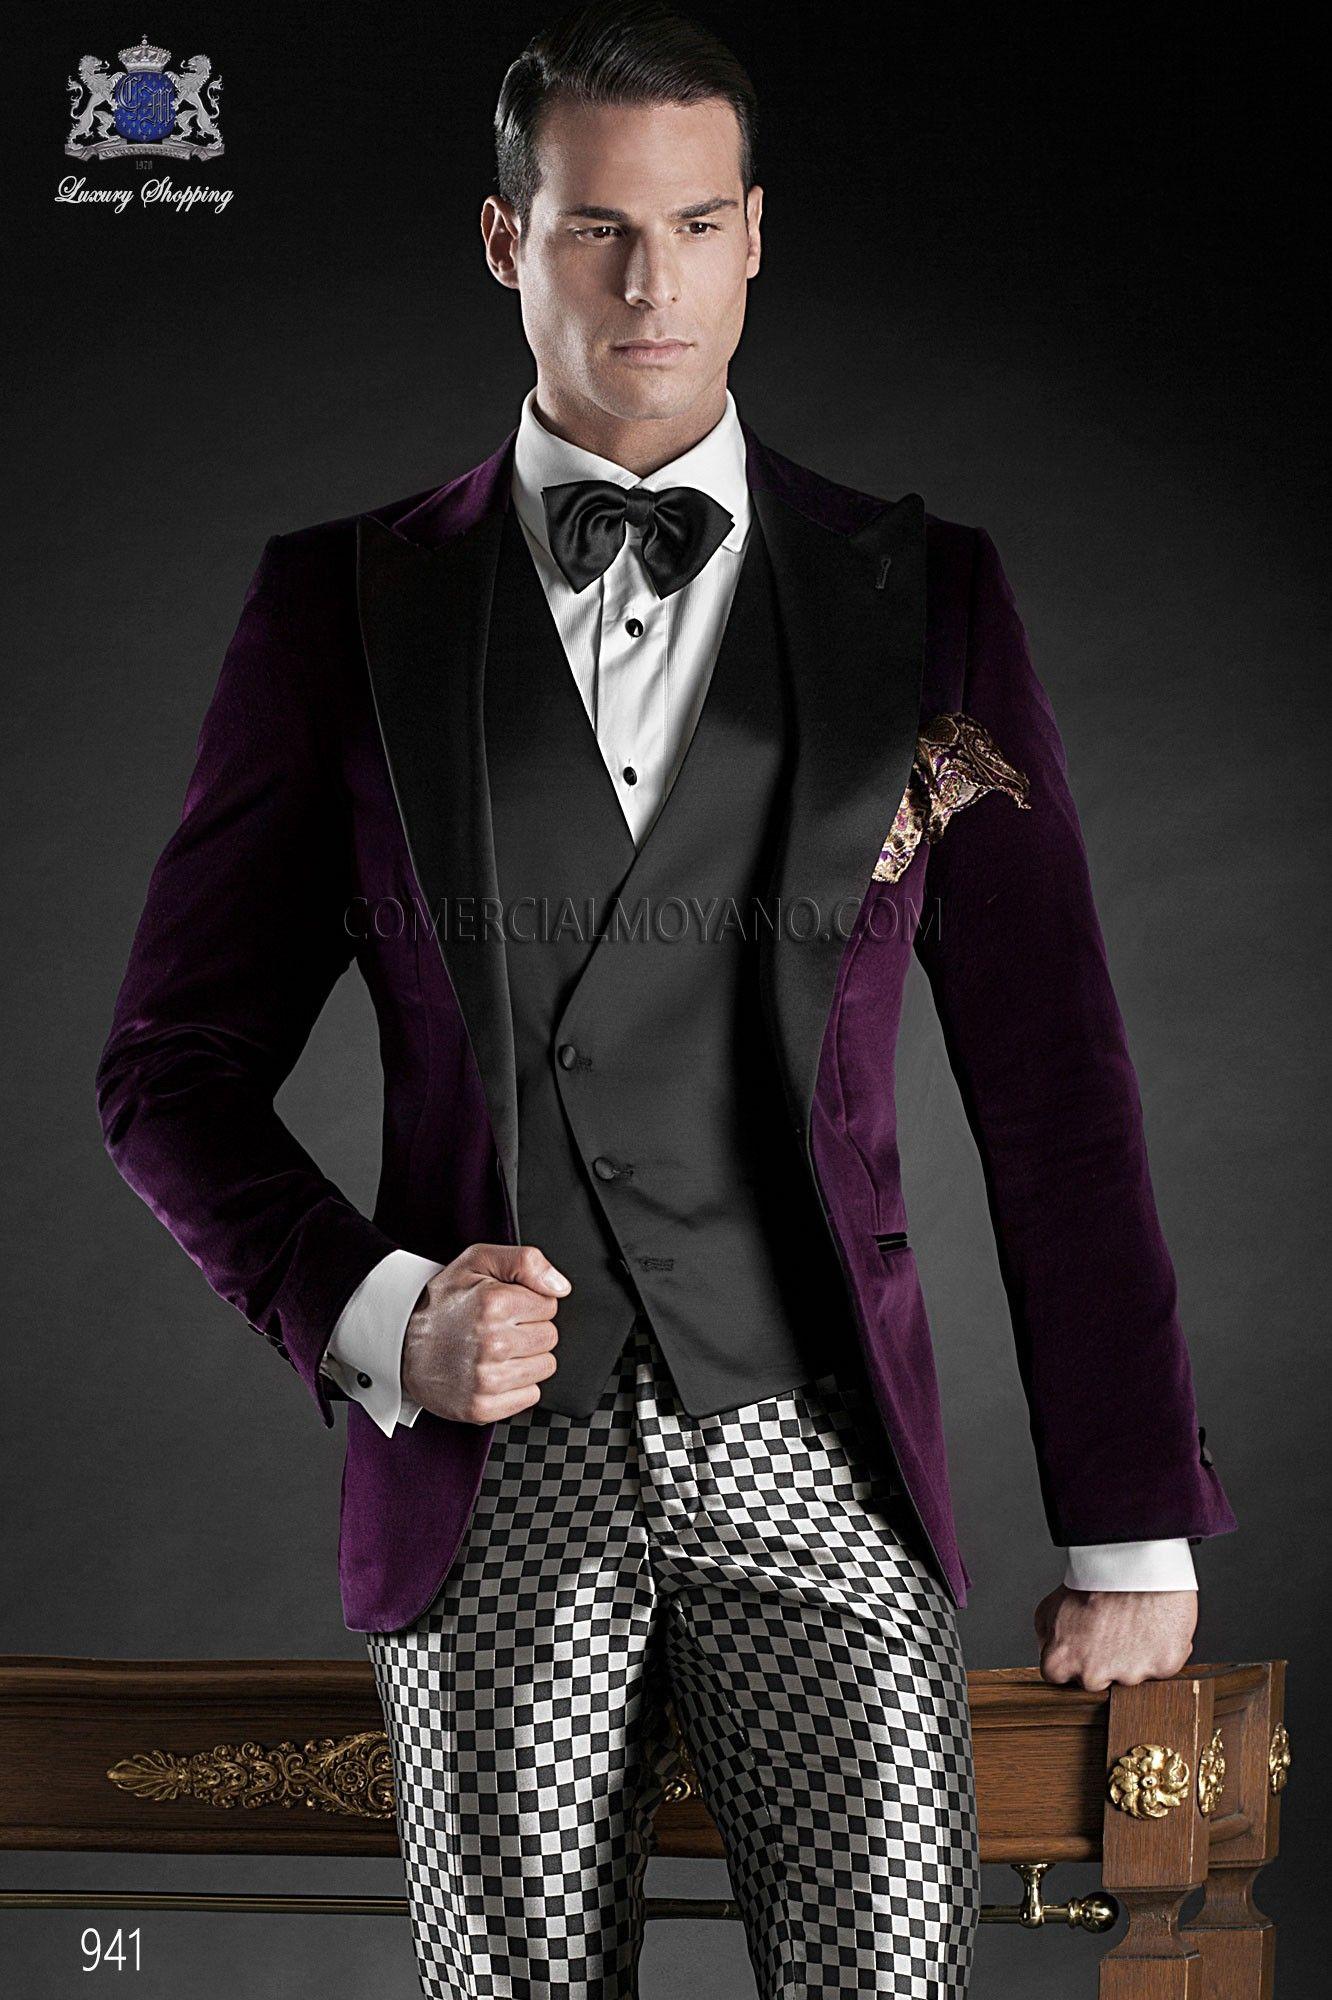 Italian Bespoke Suit Purple Cotton Velvet Tuxedo Jacket With Black Satin Peak Lapel And One Button Closure Coordinated Fashion Square Trousers